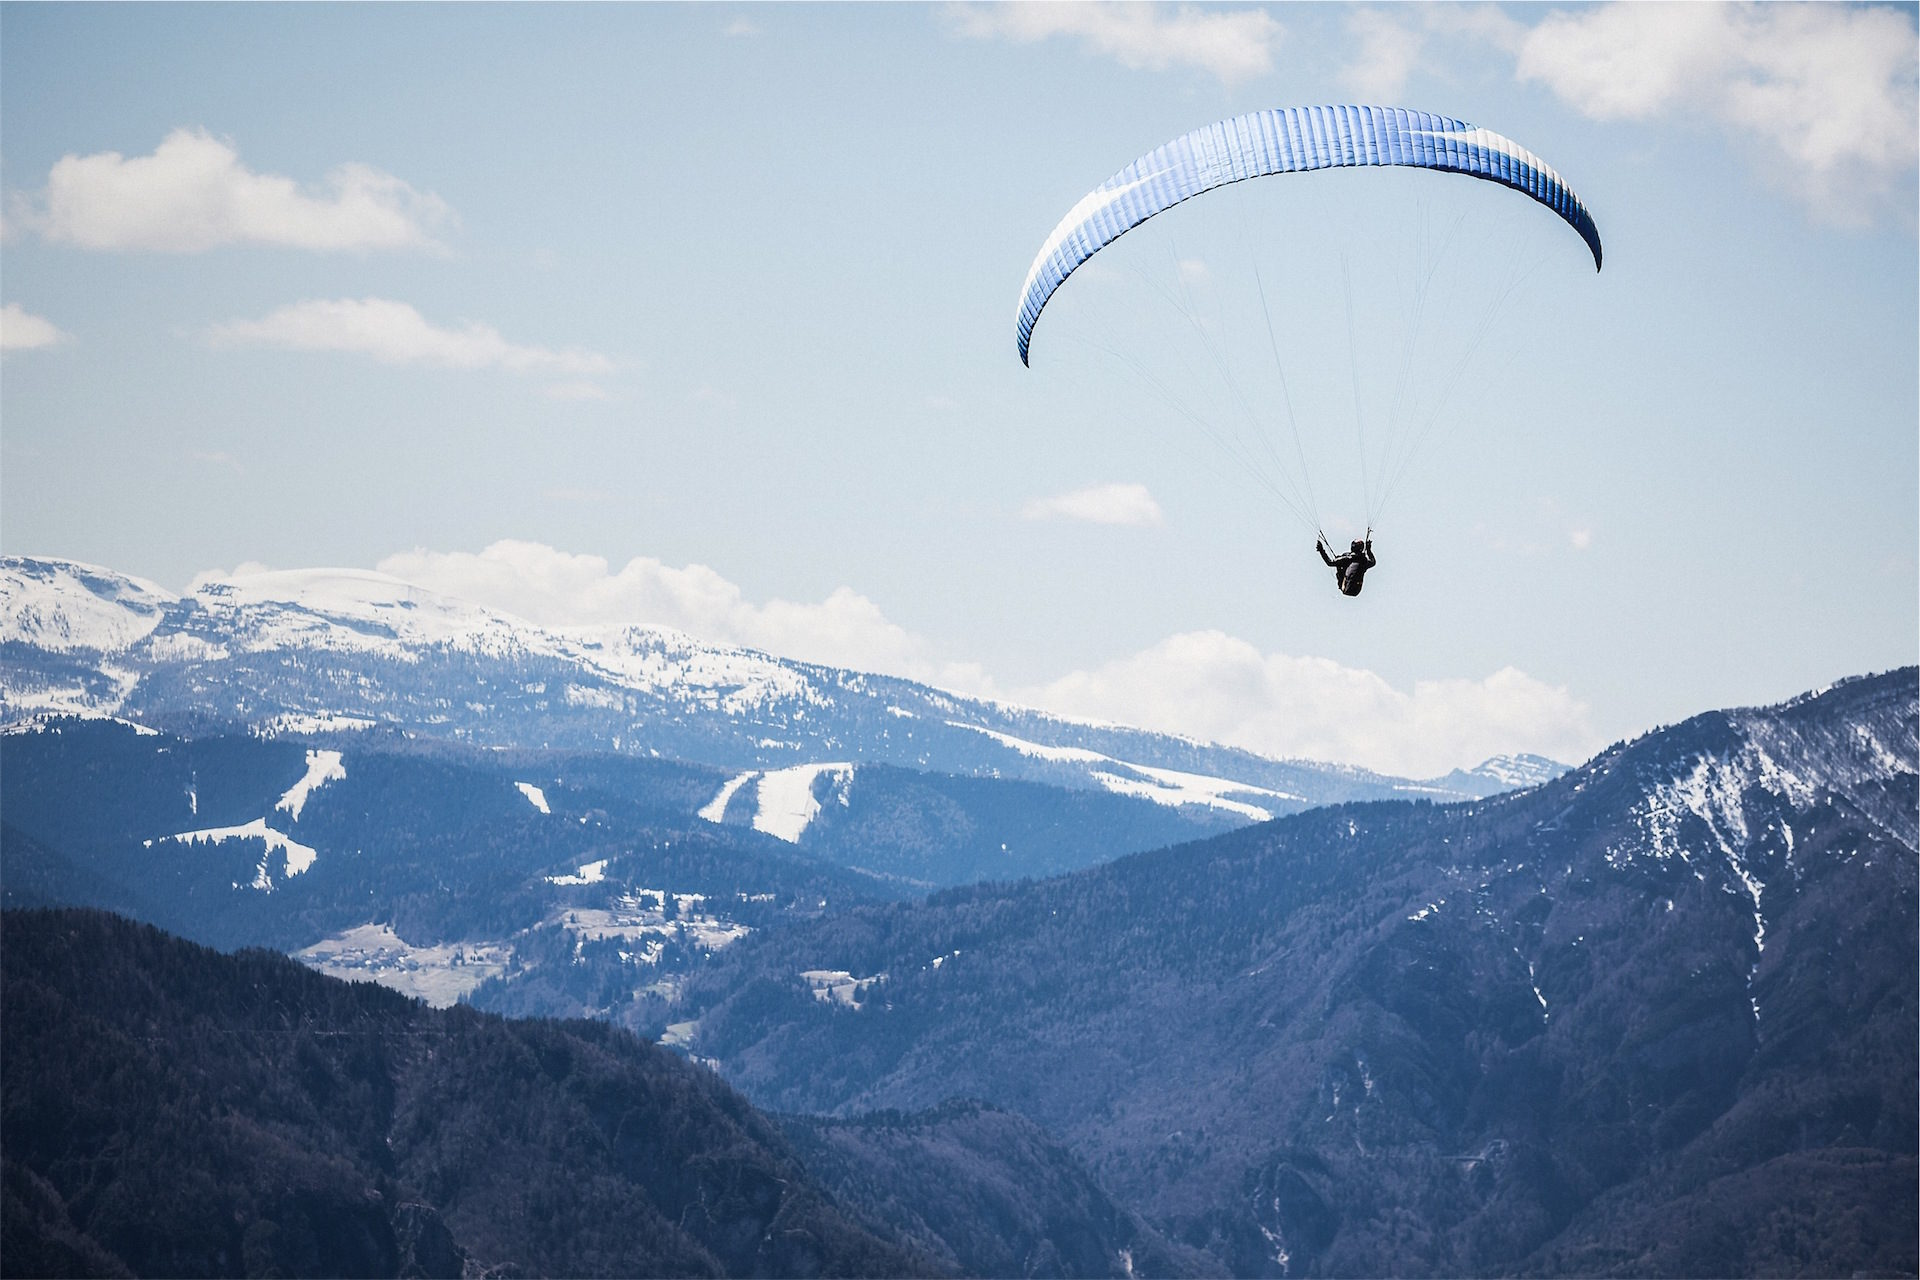 paracaidismo, paracaidas, 飛ぶ, 山, 空 - HD の壁紙 - 教授-falken.com